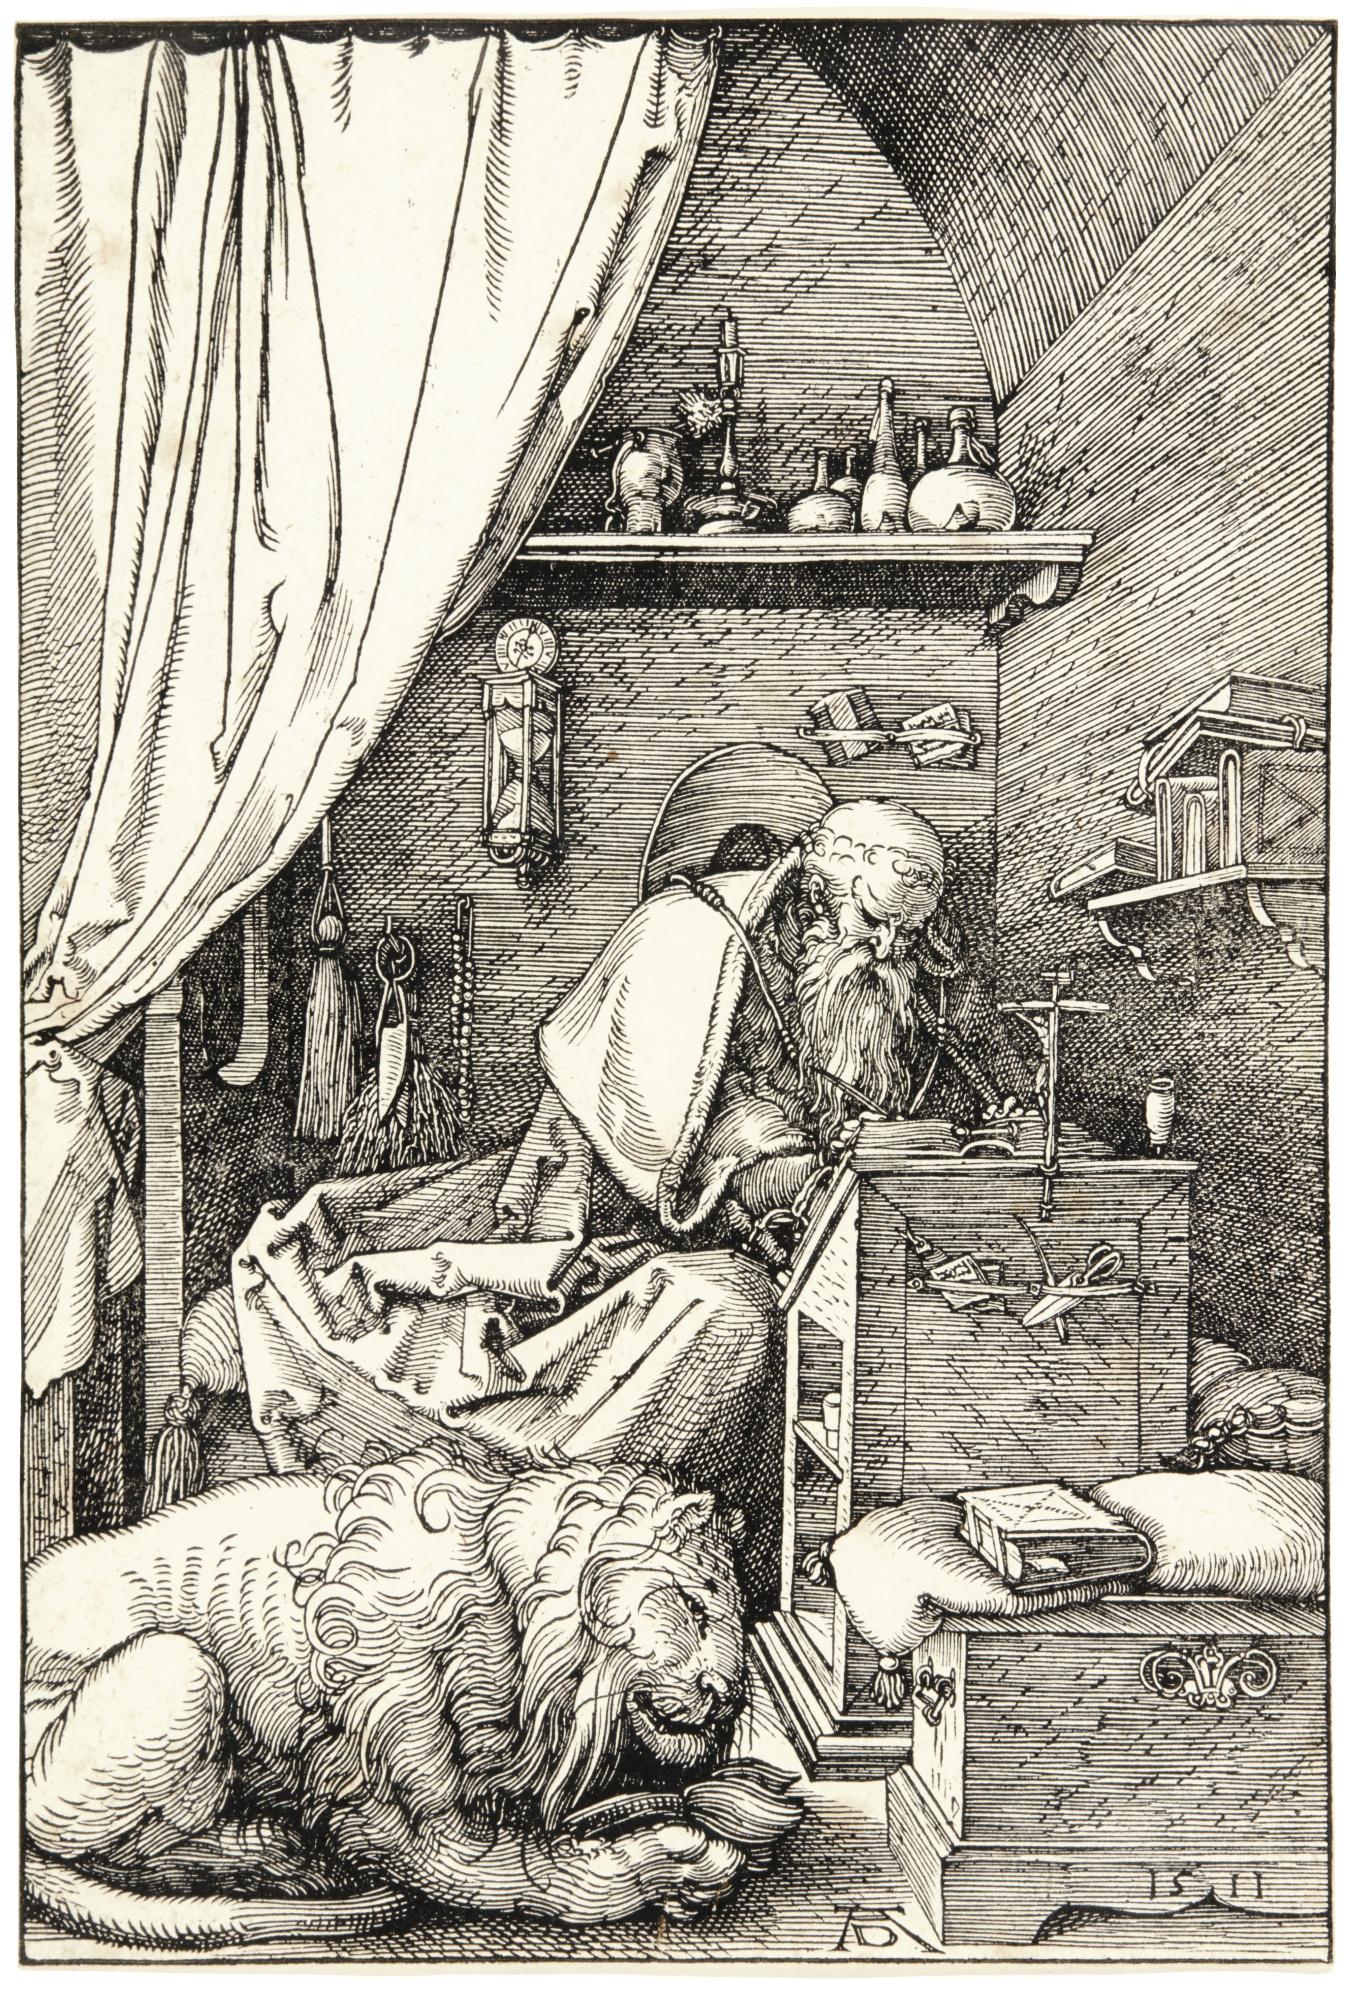 Albrecht Durer-Saint Jerome In His Cell (B. 114; M., Holl. 228)-1511